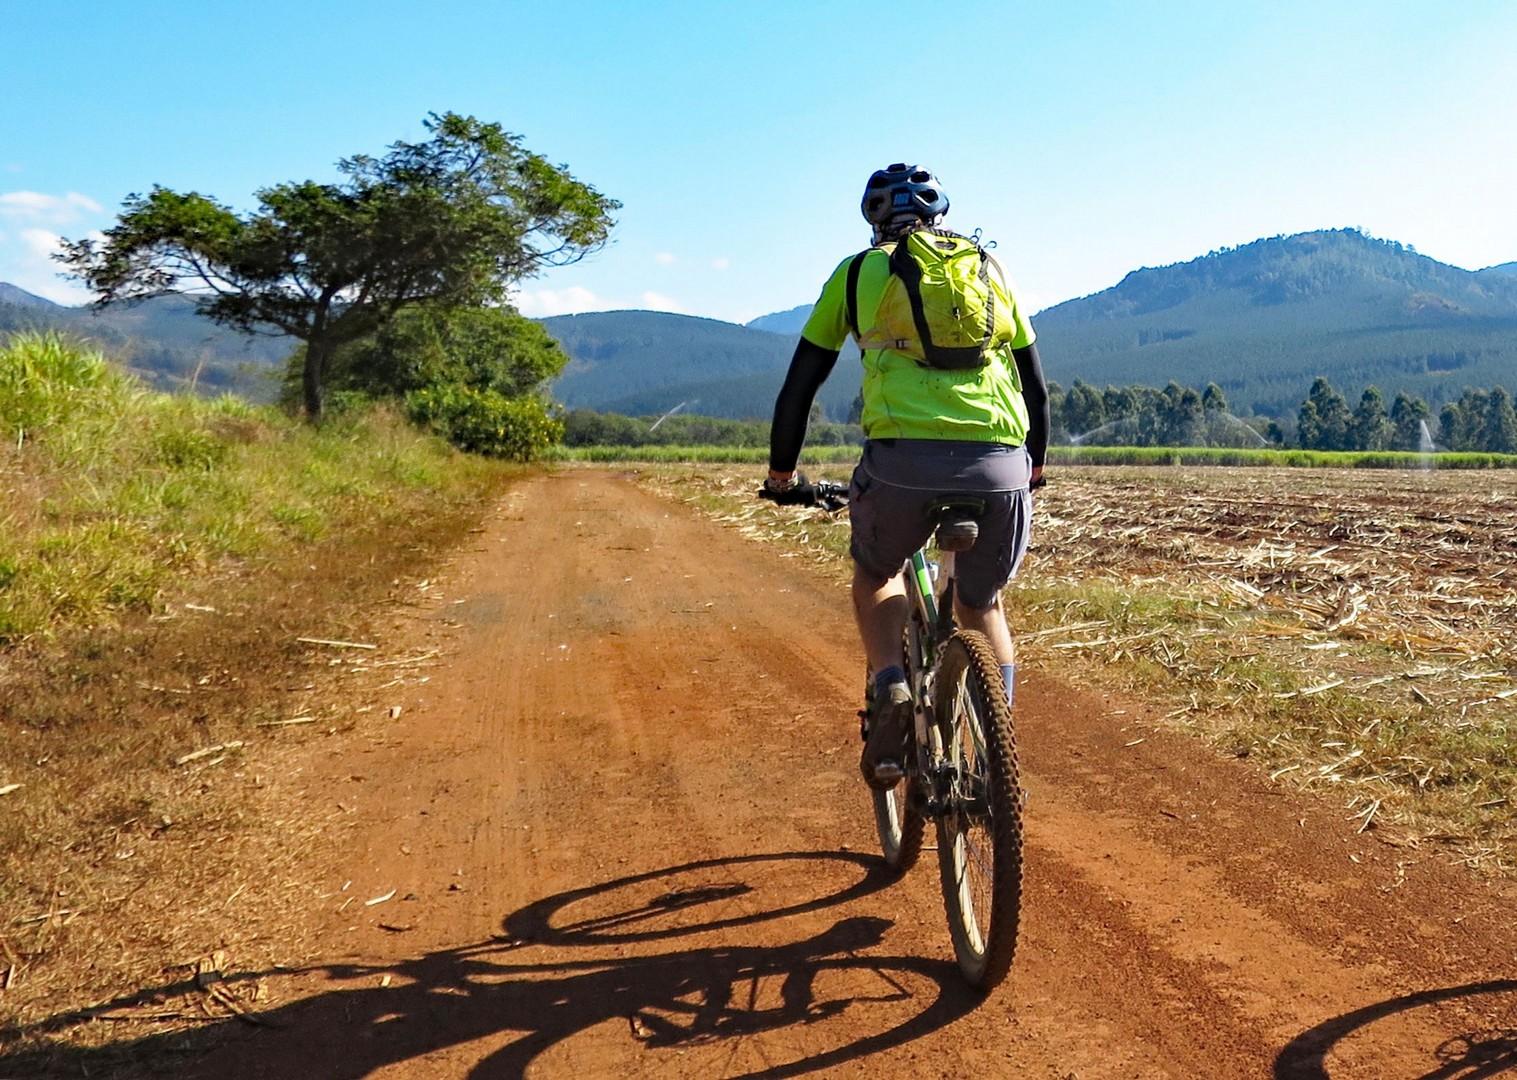 unexplored-biking-mountain-bike-holiday-in-africa-swaziland.jpg - Swaziland - Singletrack and Sundowners - Guided Mountain Bike Holiday - Mountain Biking